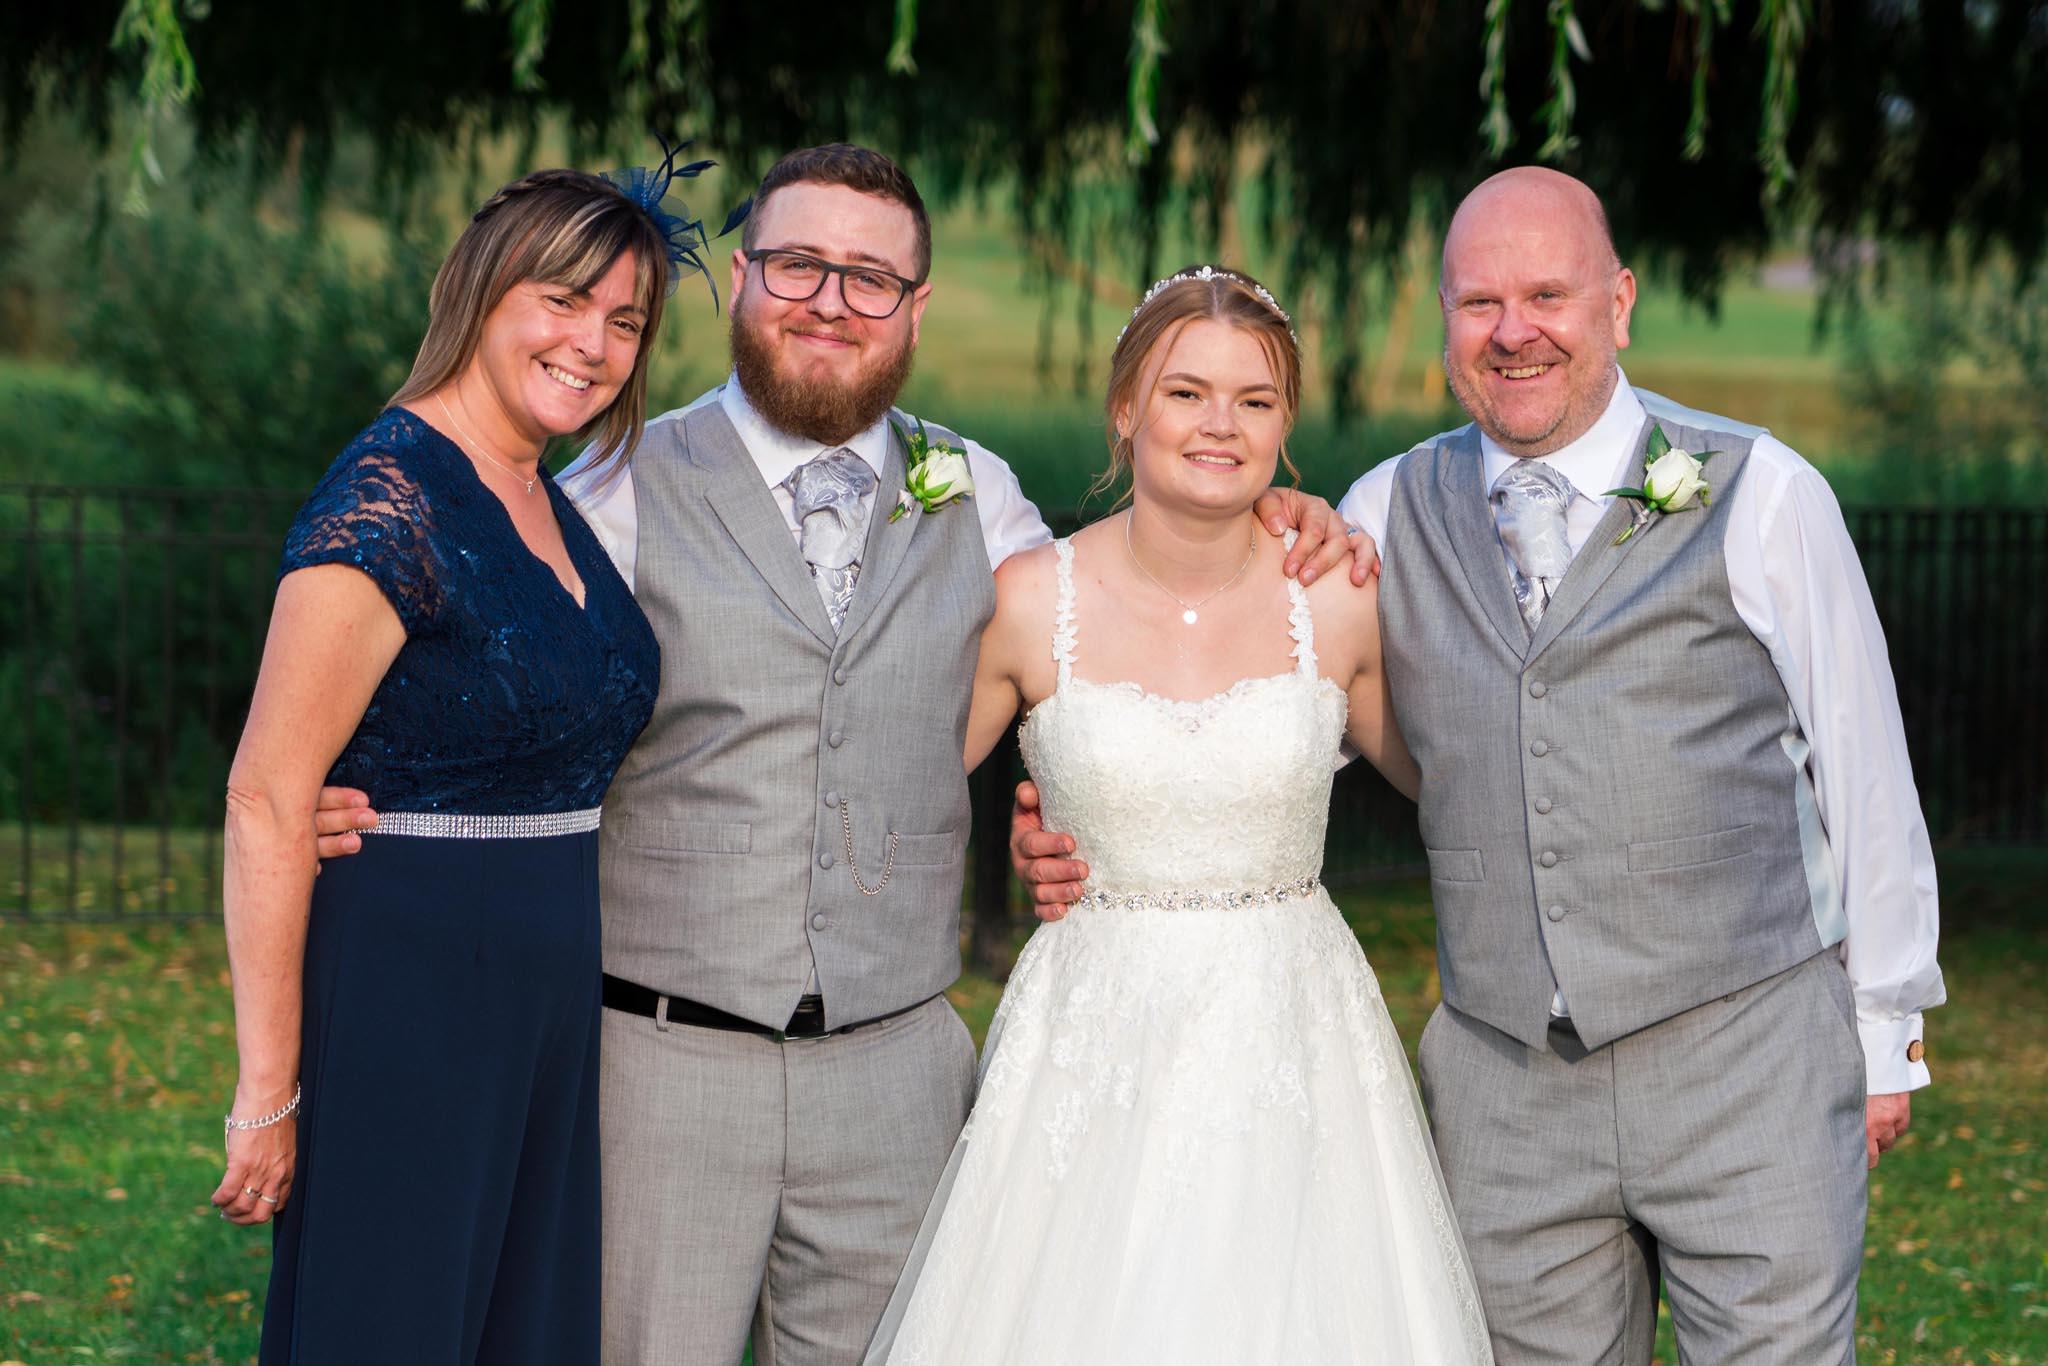 702-family-friends-Luke-Yasmin-The-Rayleigh-Club-Wedding-Photography.jpg